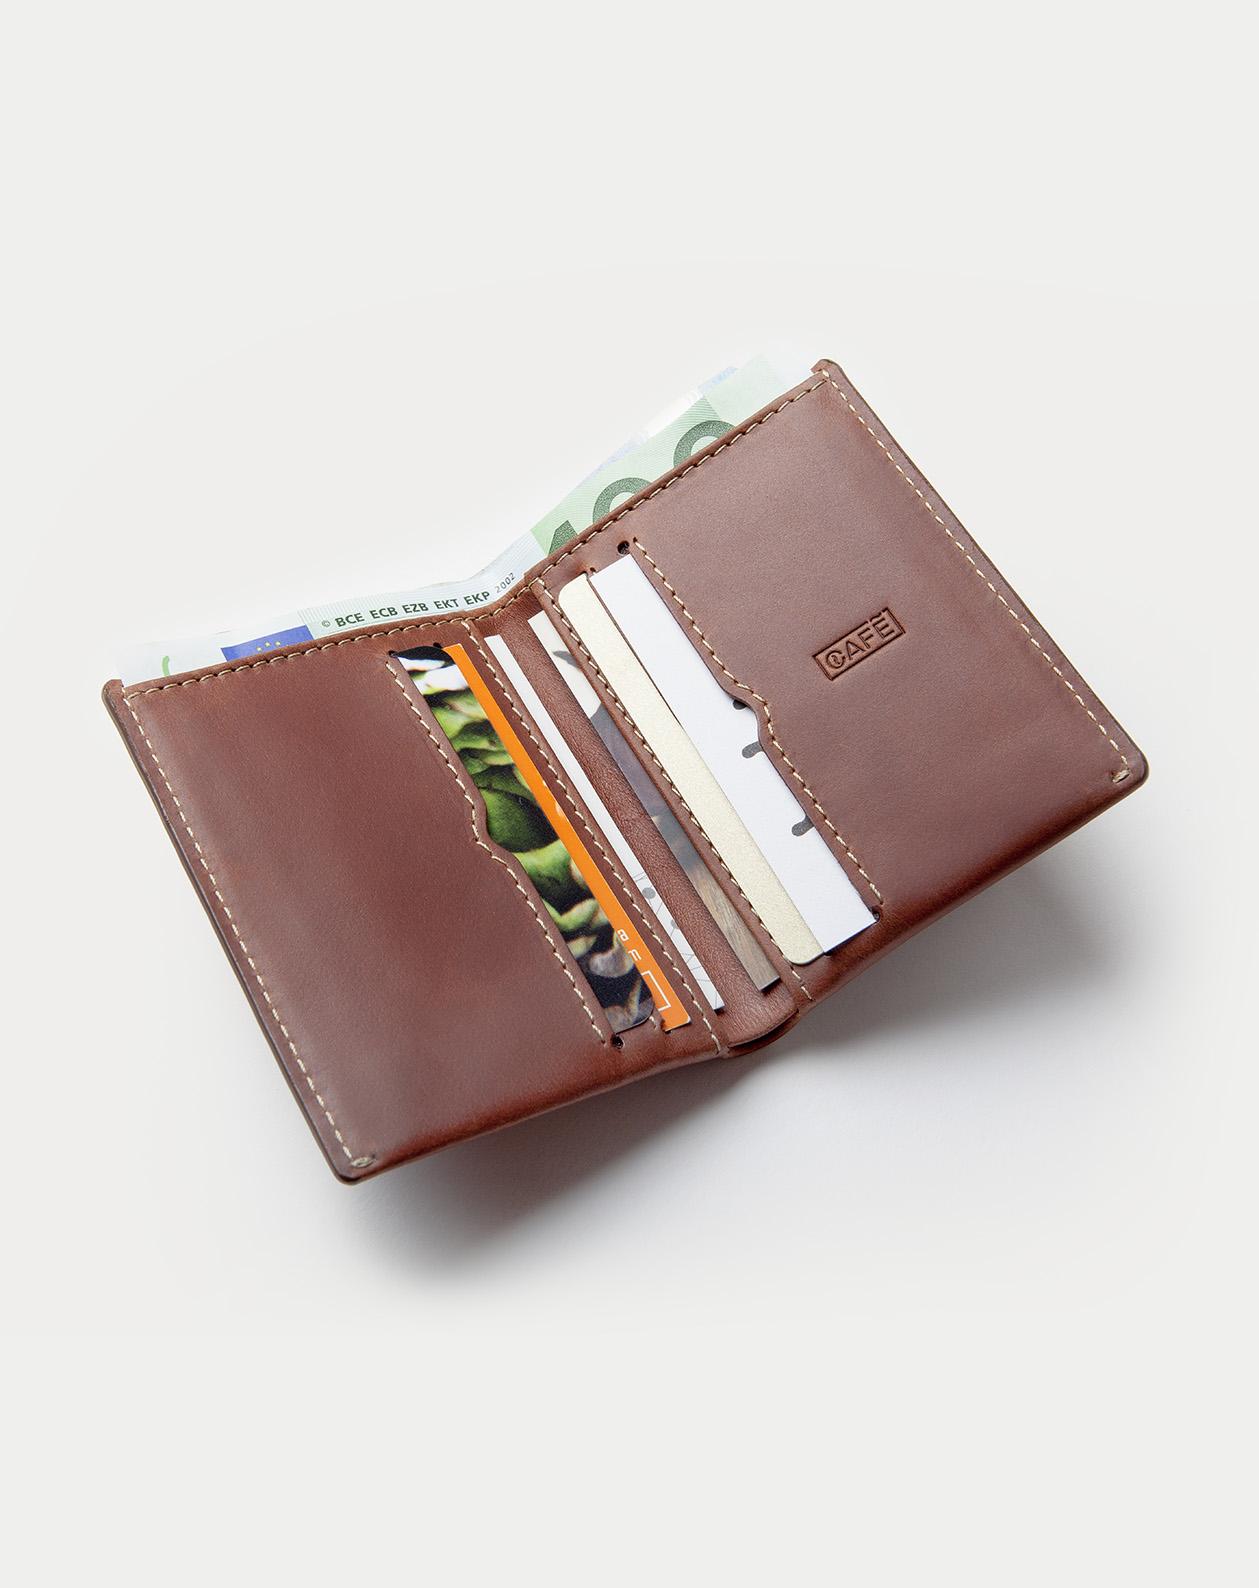 Cartera de piel costa rica roasted,en detalle. Slim Leather Wallet Costa Rica.